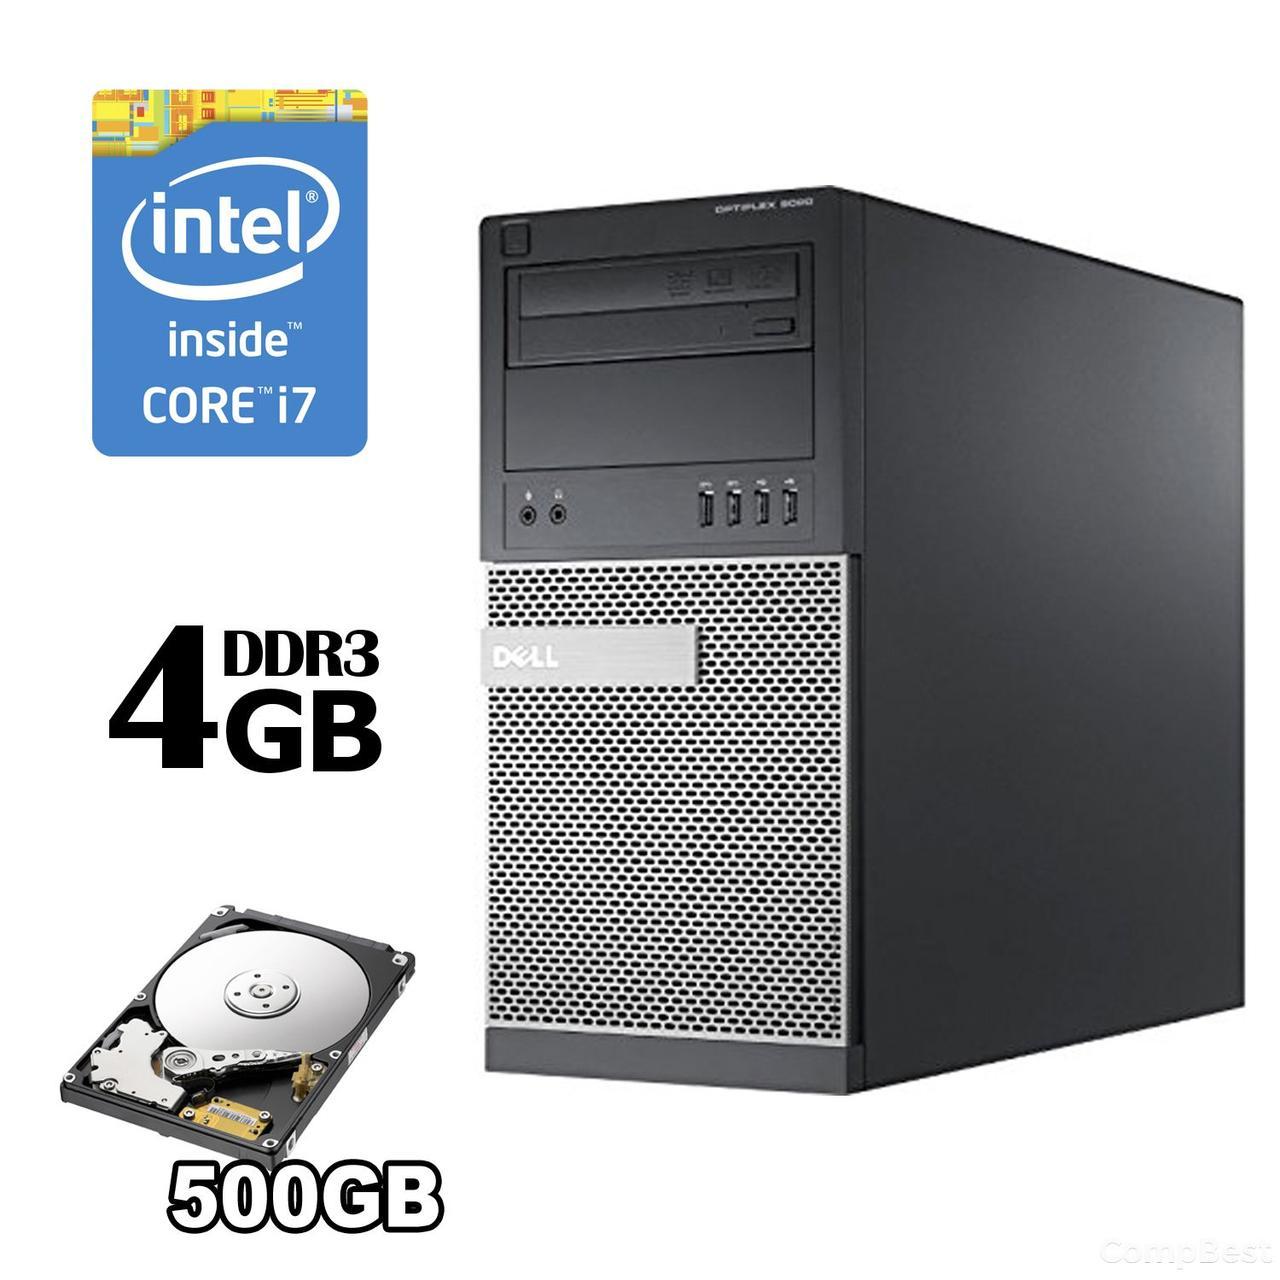 Dell Optiplex 9020 Tower / Intel® Core™ i7-4790 (4 (8) ядра по 3.6 - 4.0 GHz) / 4GB DDR3 / 500 HDD